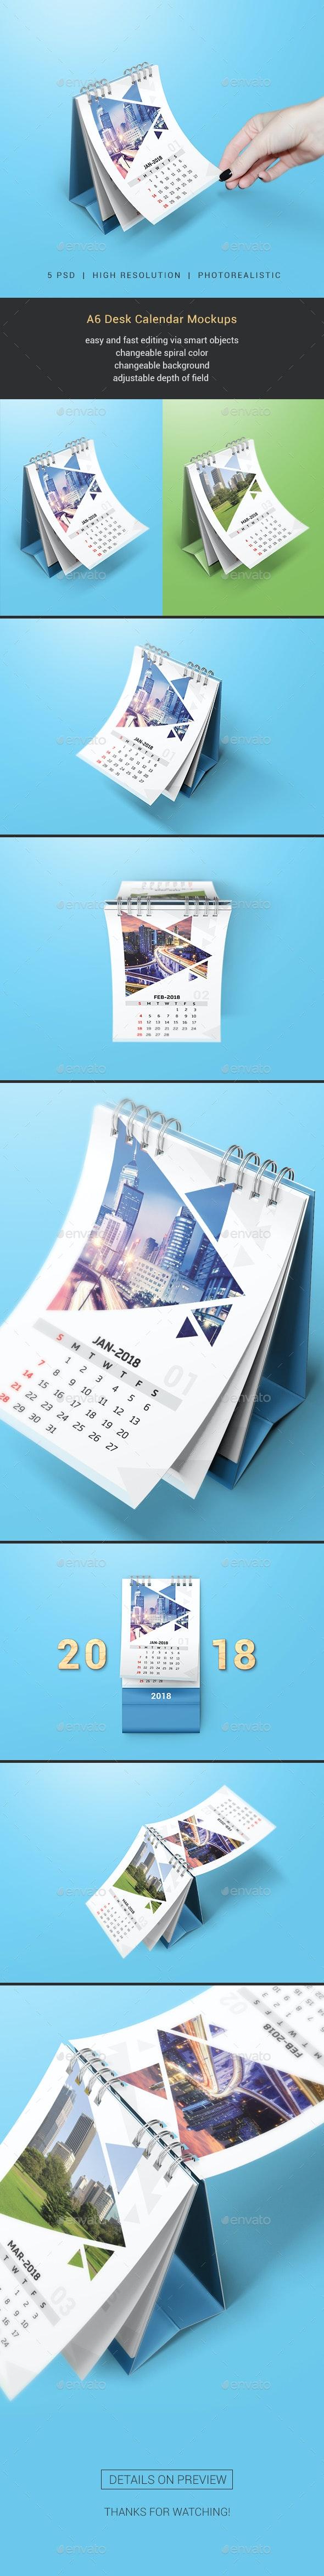 Desk Calendar Mockups - Miscellaneous Print